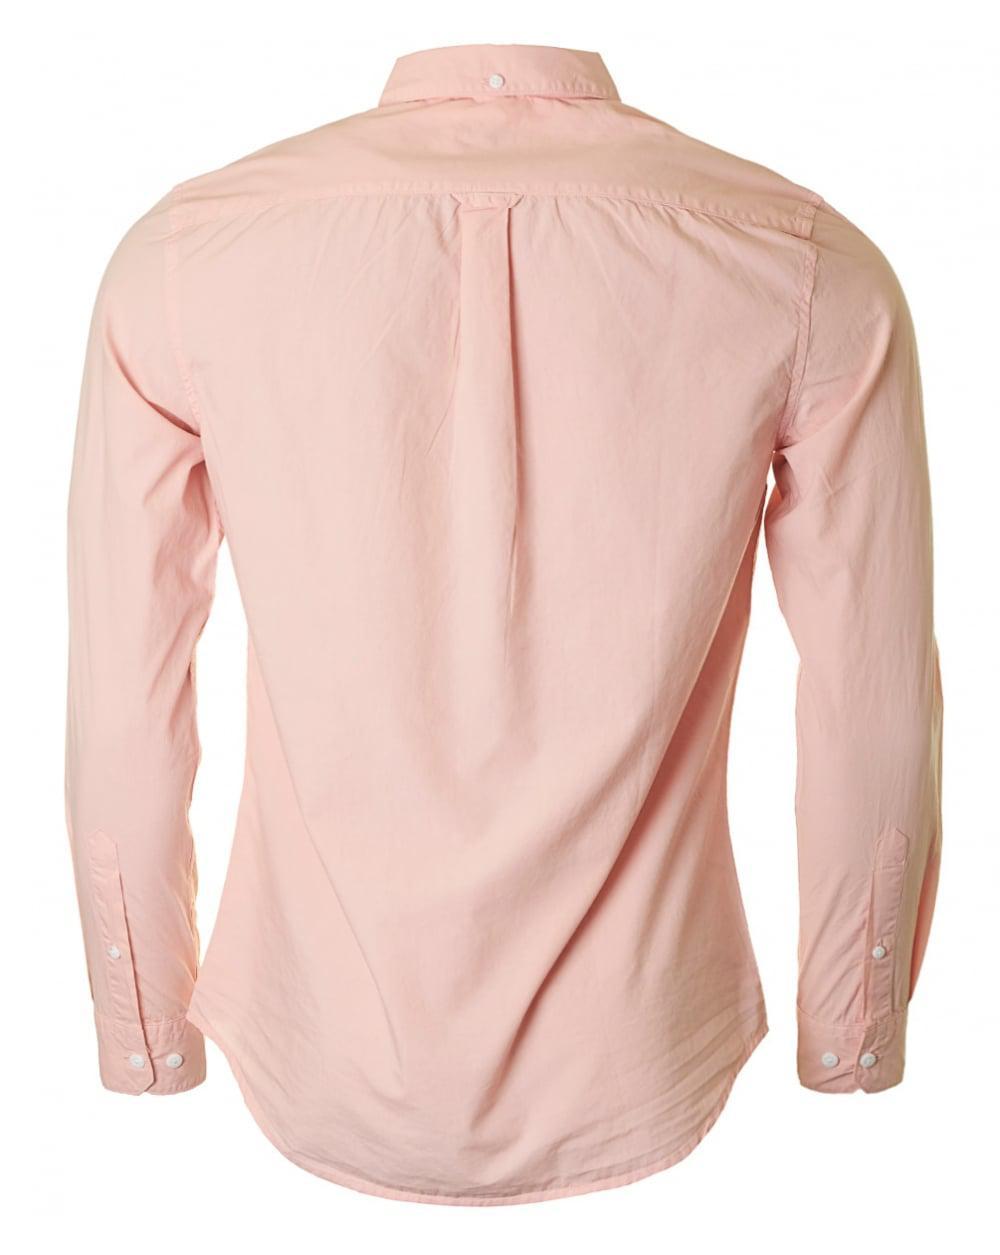 723629bddf67 Farah Farley Long Sleeved Poplin Shirt in Pink for Men - Save 47% - Lyst